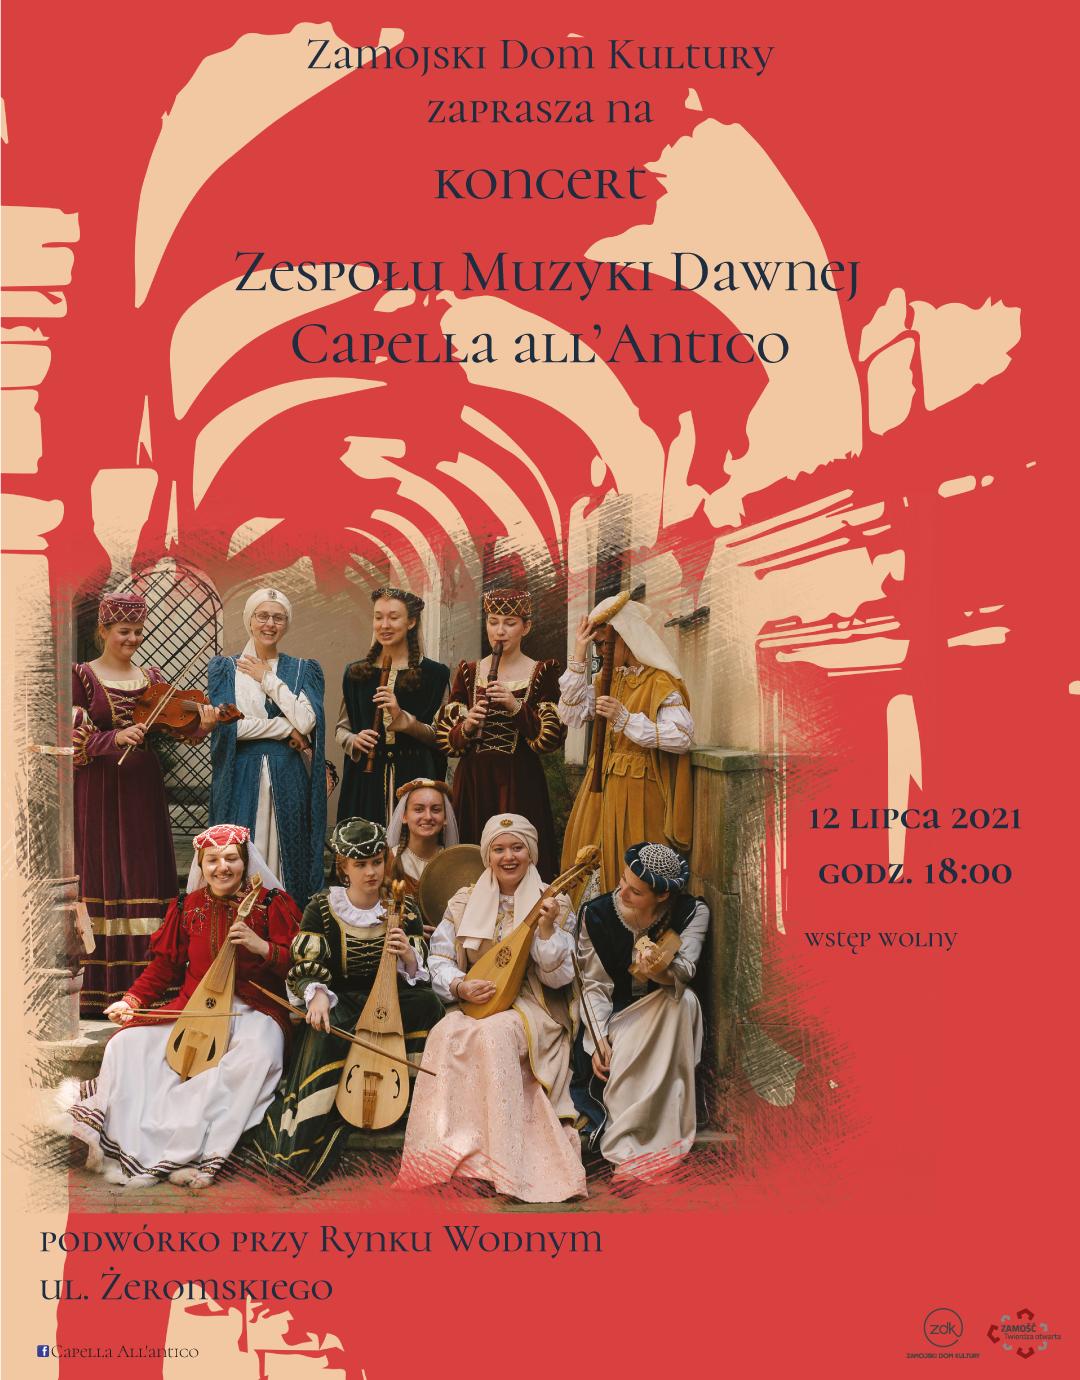 insta post capella 1 Koncert Capella all' Antico już dzisiaj